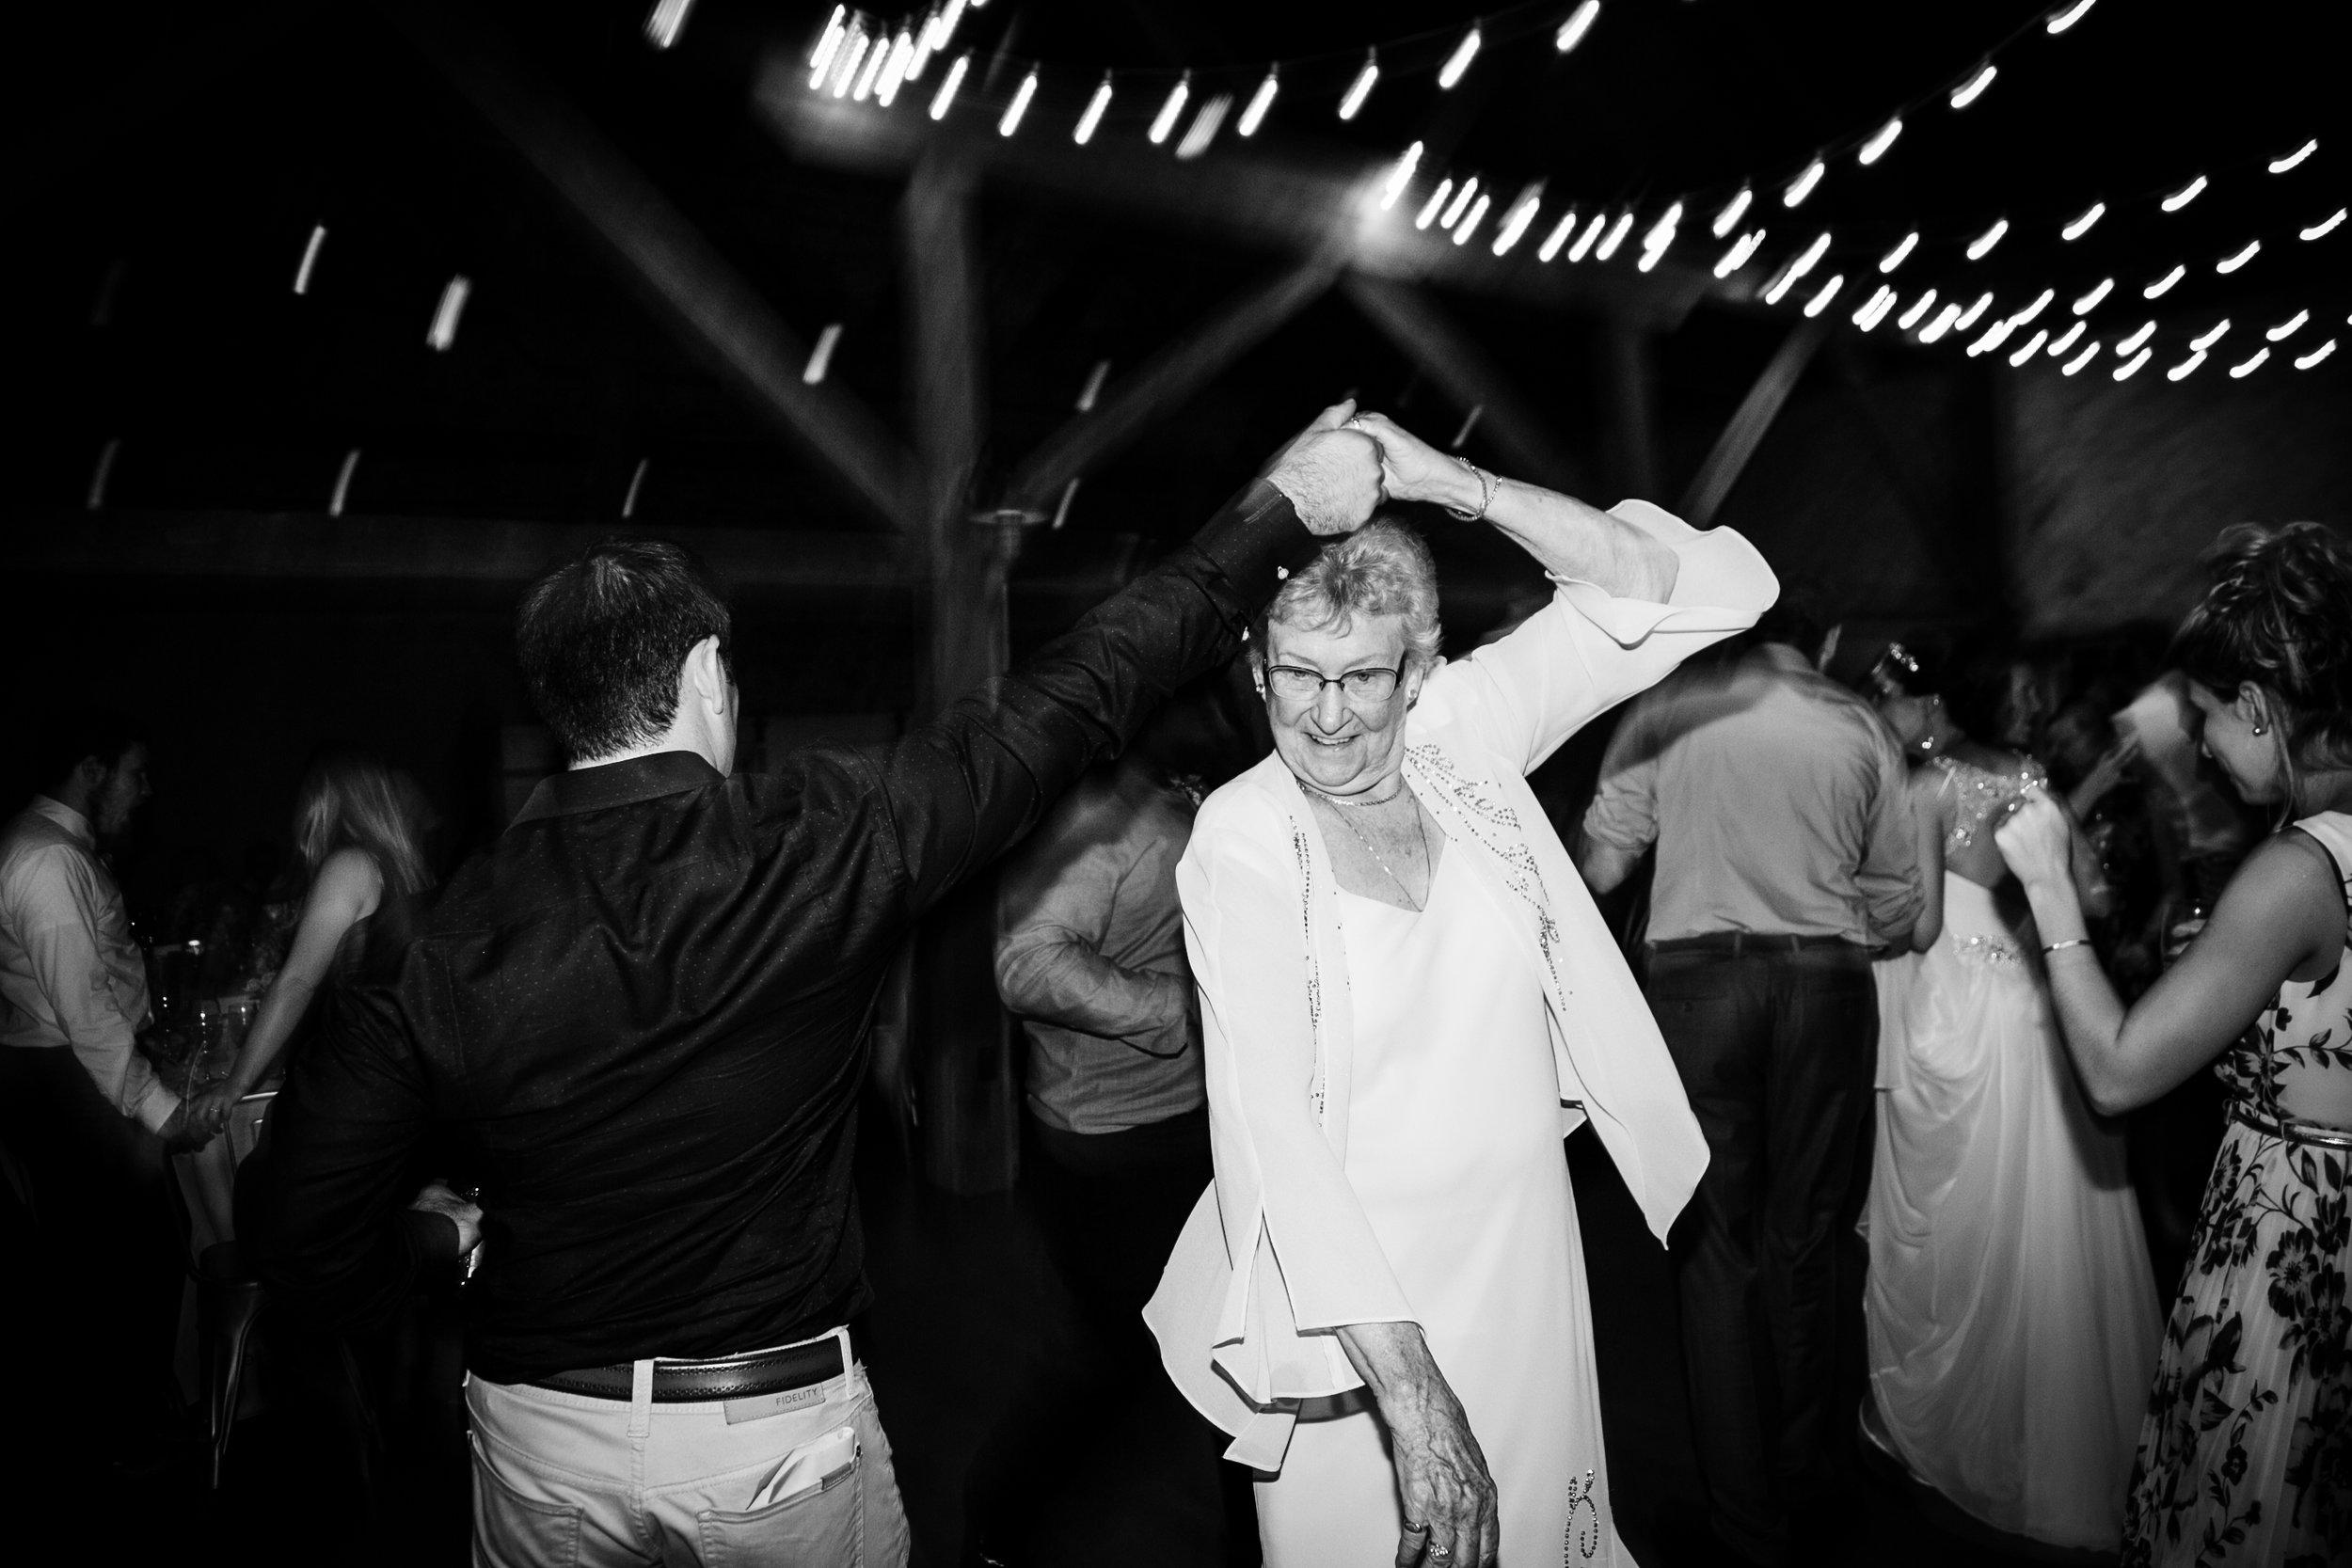 TYLER ARBORETUM WEDDING PHOTOGRAPHY LOVESTRUCK PICTURES-108.jpg